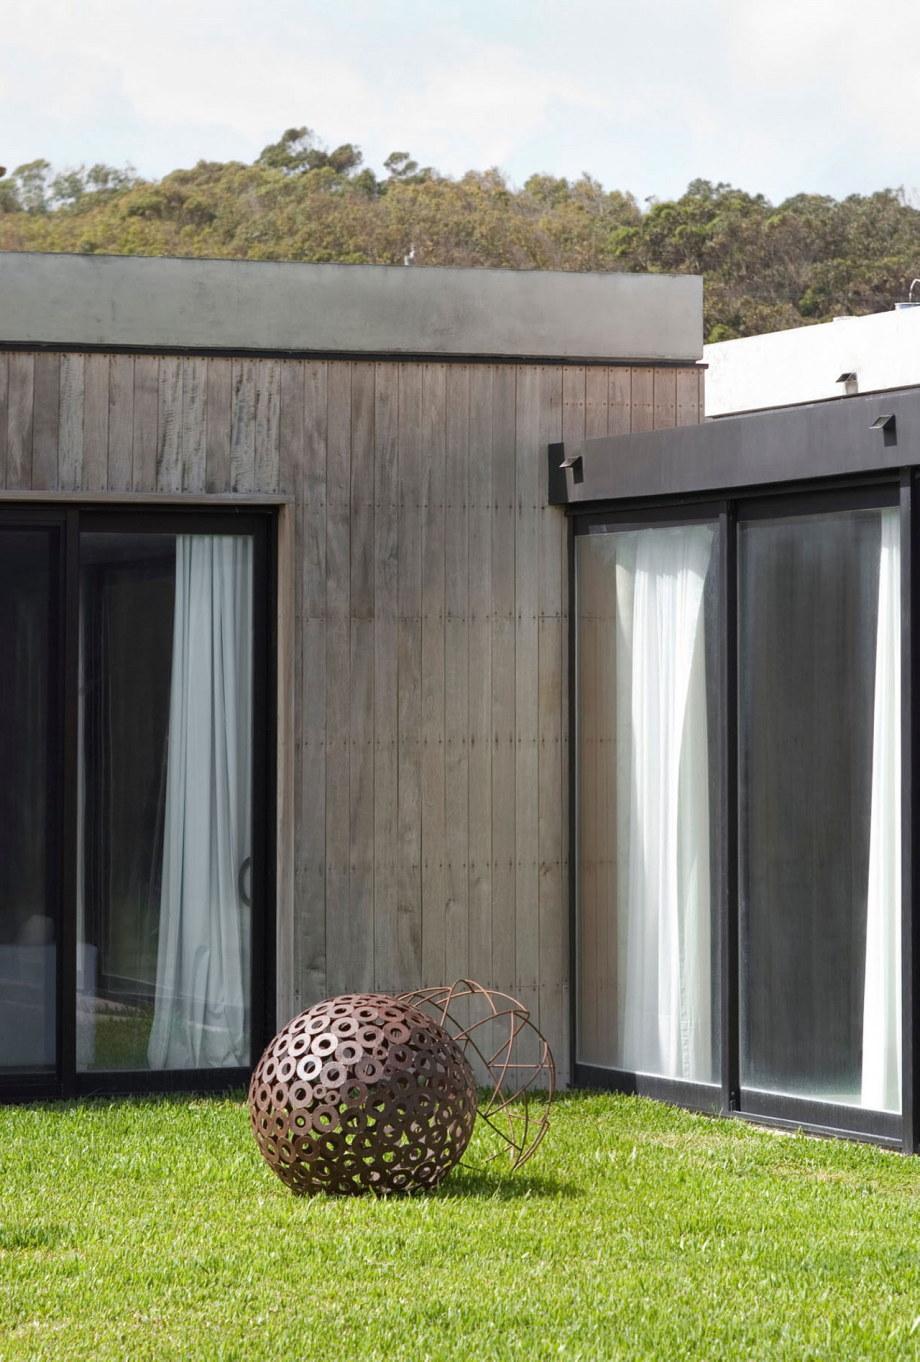 The beach house La Boyita Residence by Martin Gomez Arguitectos, Uruguay 8